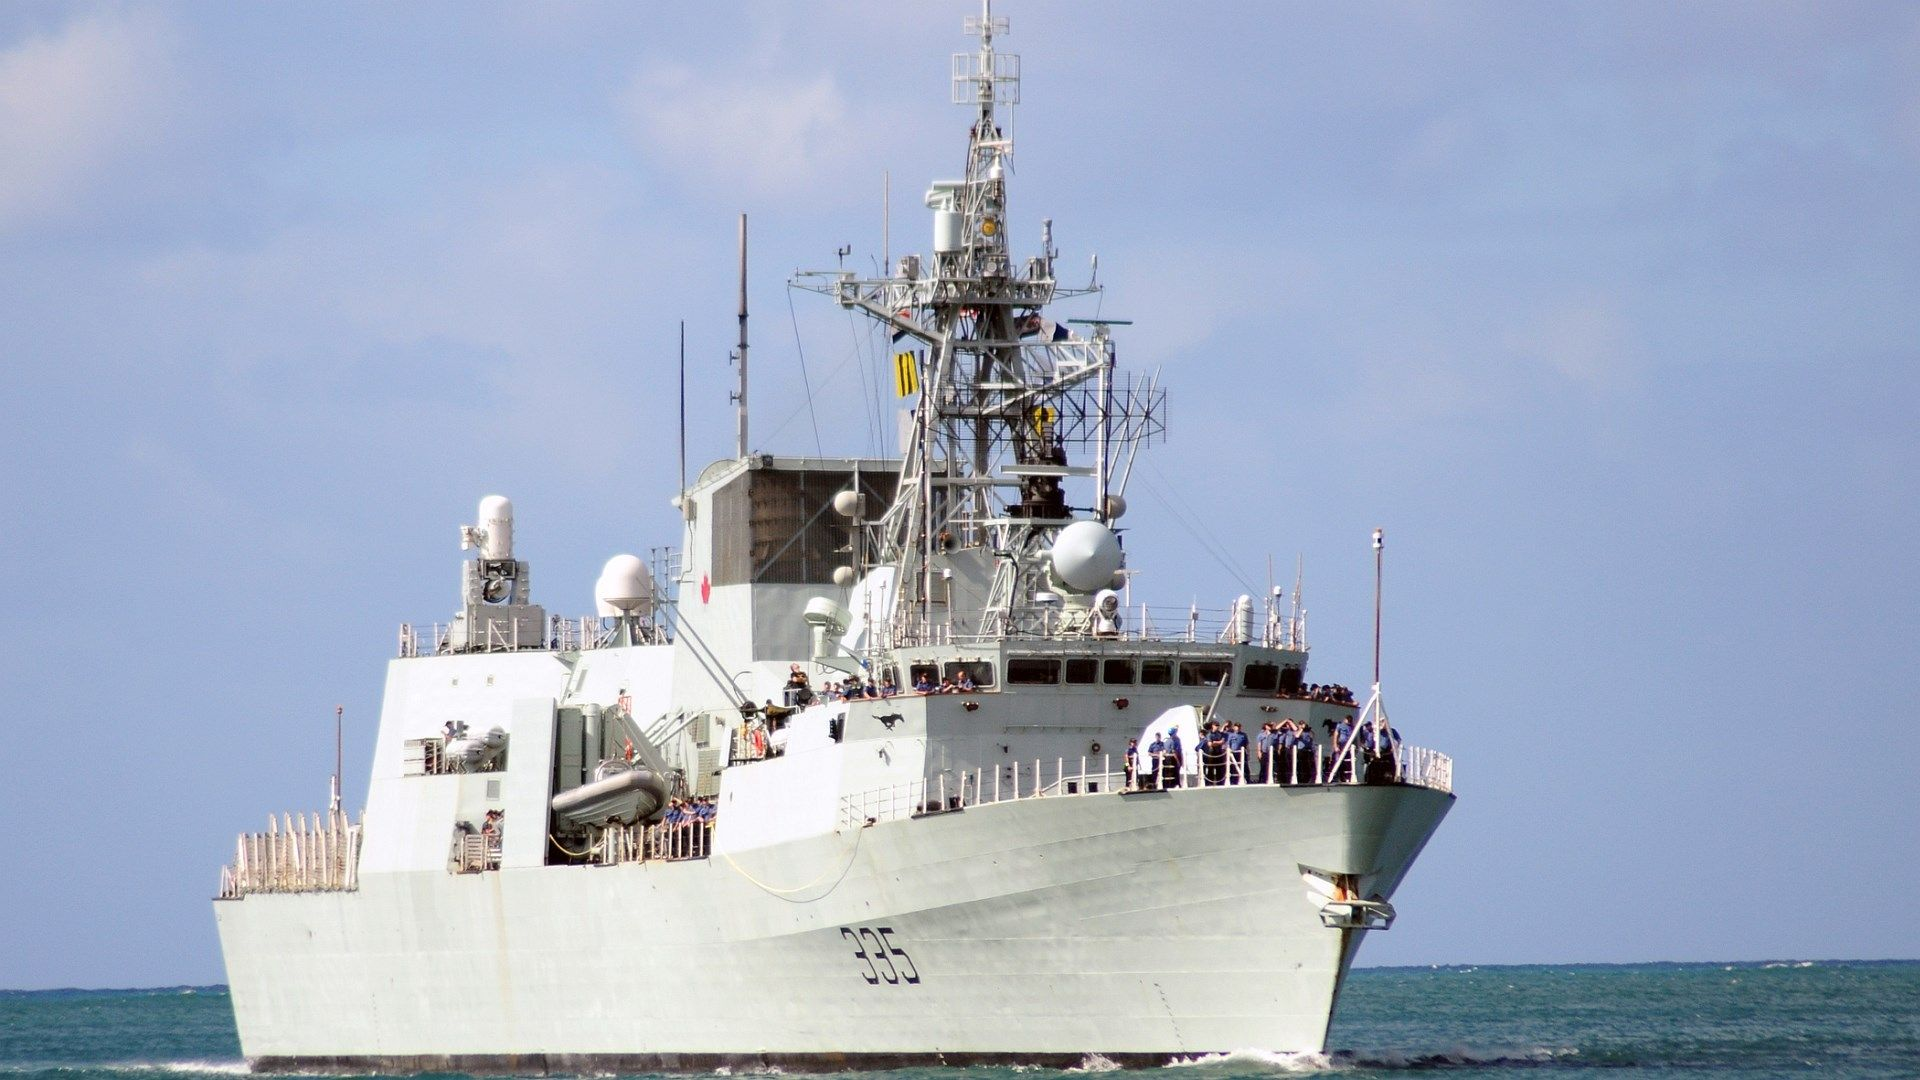 Hmcs Calgary Ffh 335 Themed 1920x1080 282 Kb Speedboats Royal Canadian Navy Navy Ships Fleet Week